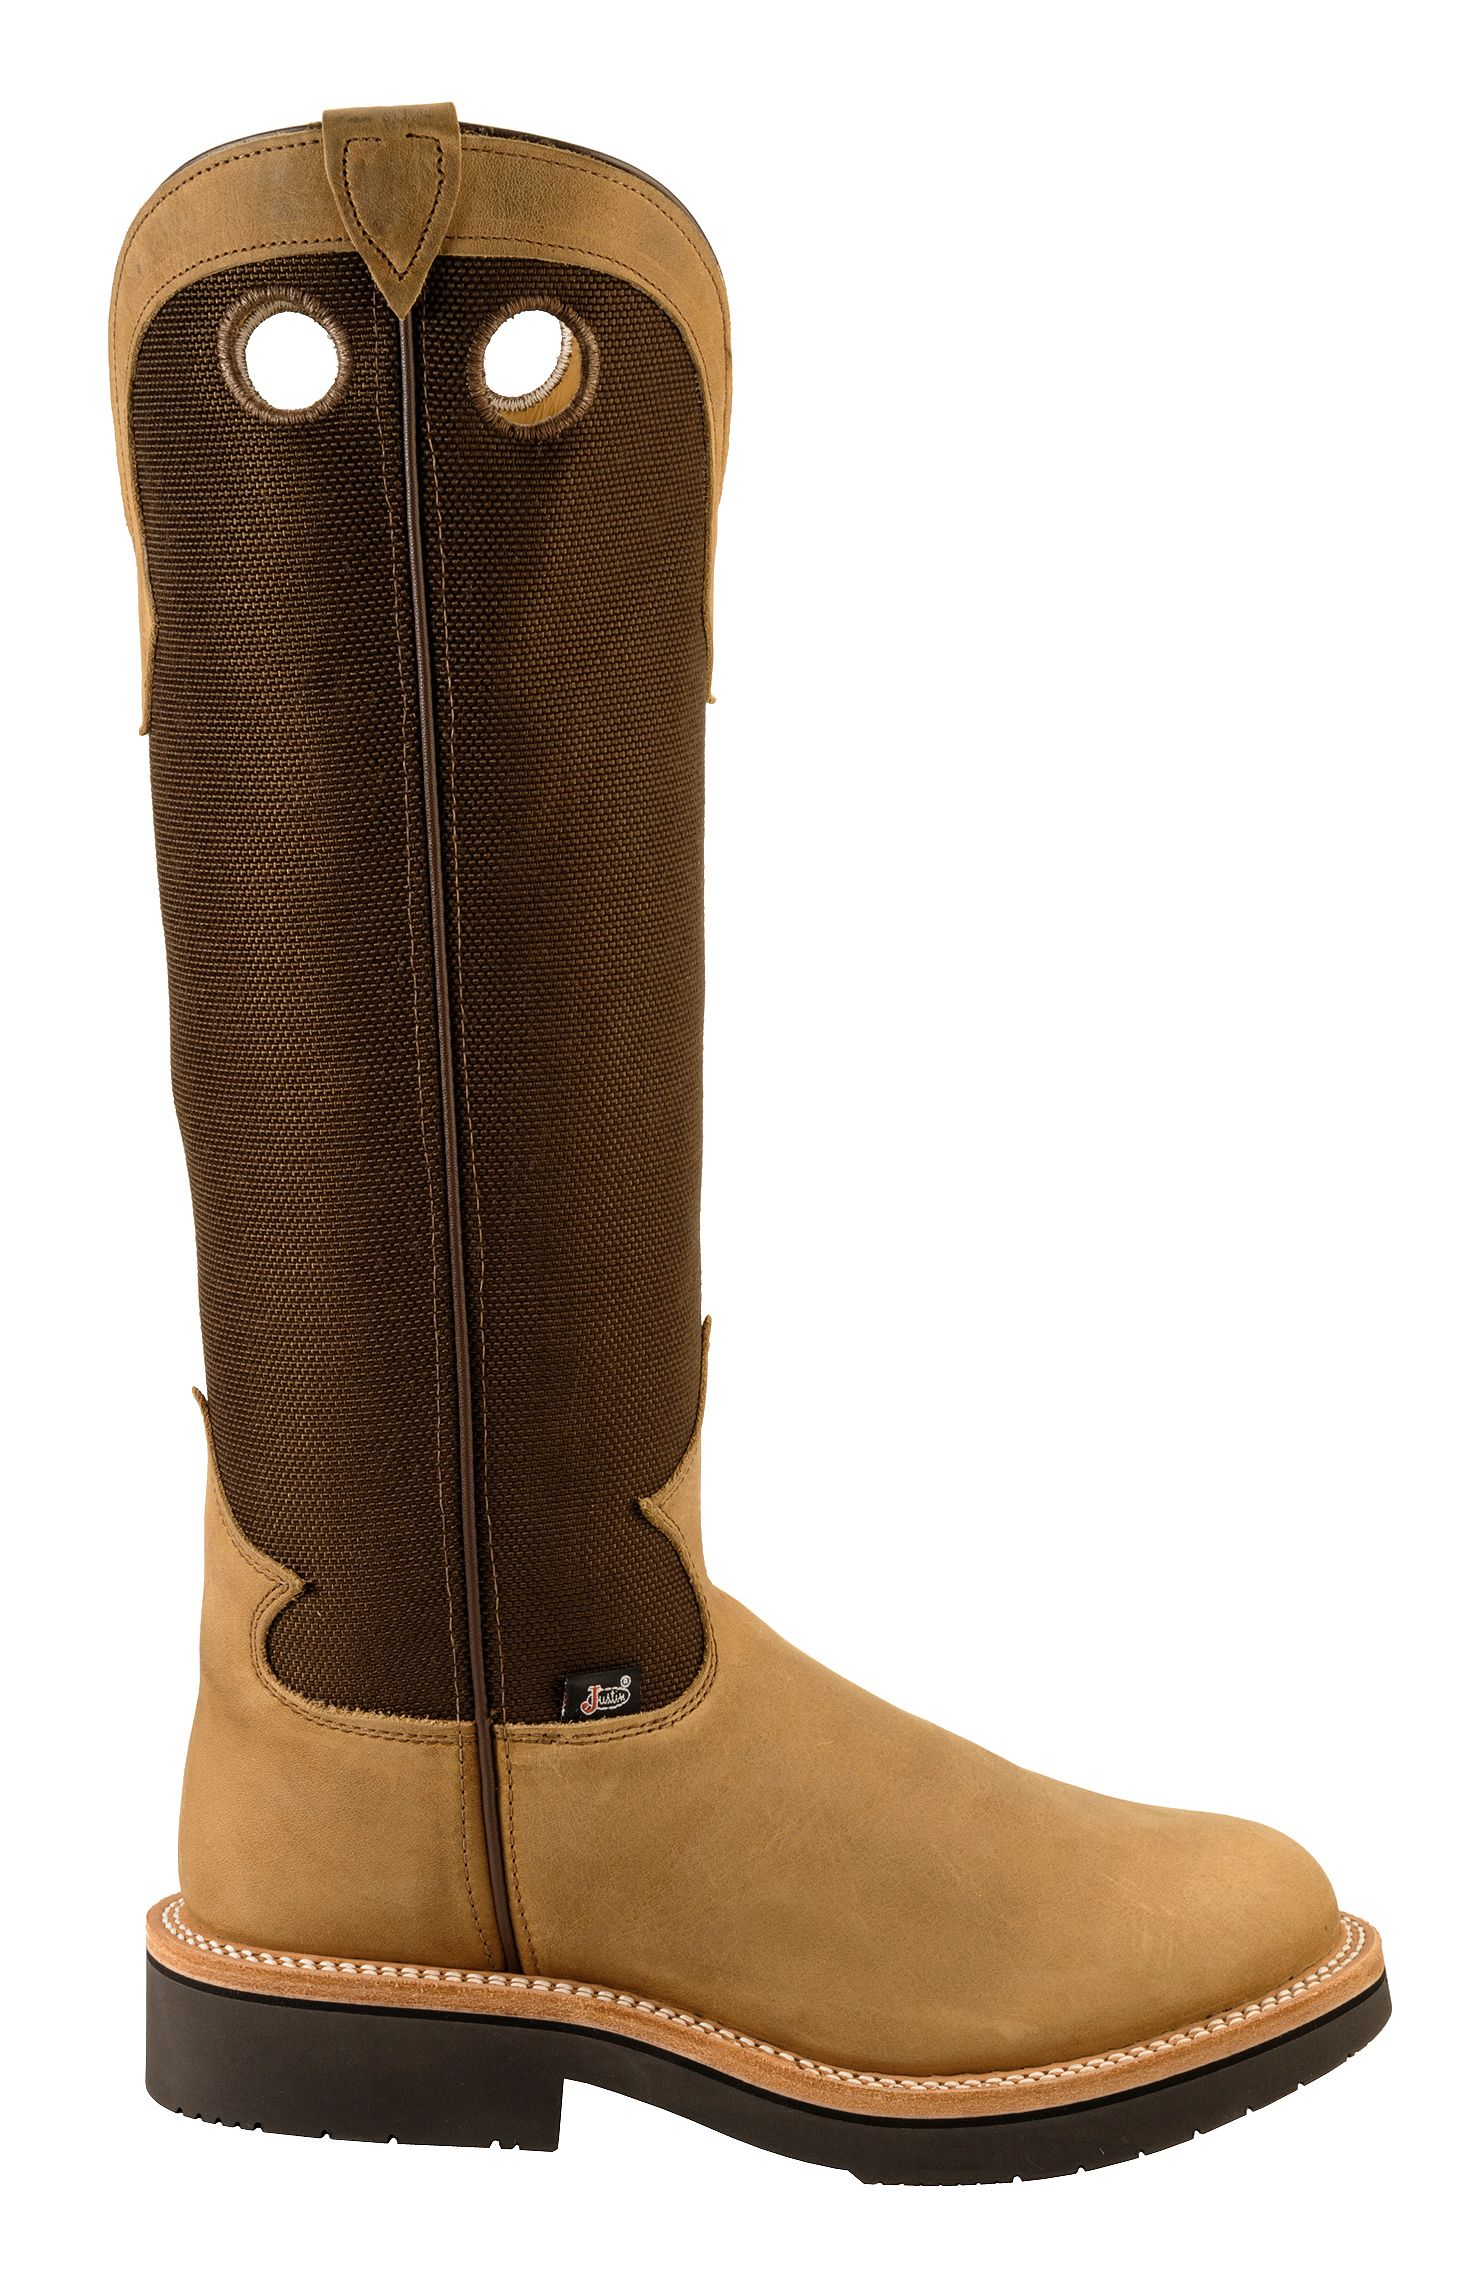 justin dune traction snake proof cowboy boots round toe sheplers. Black Bedroom Furniture Sets. Home Design Ideas